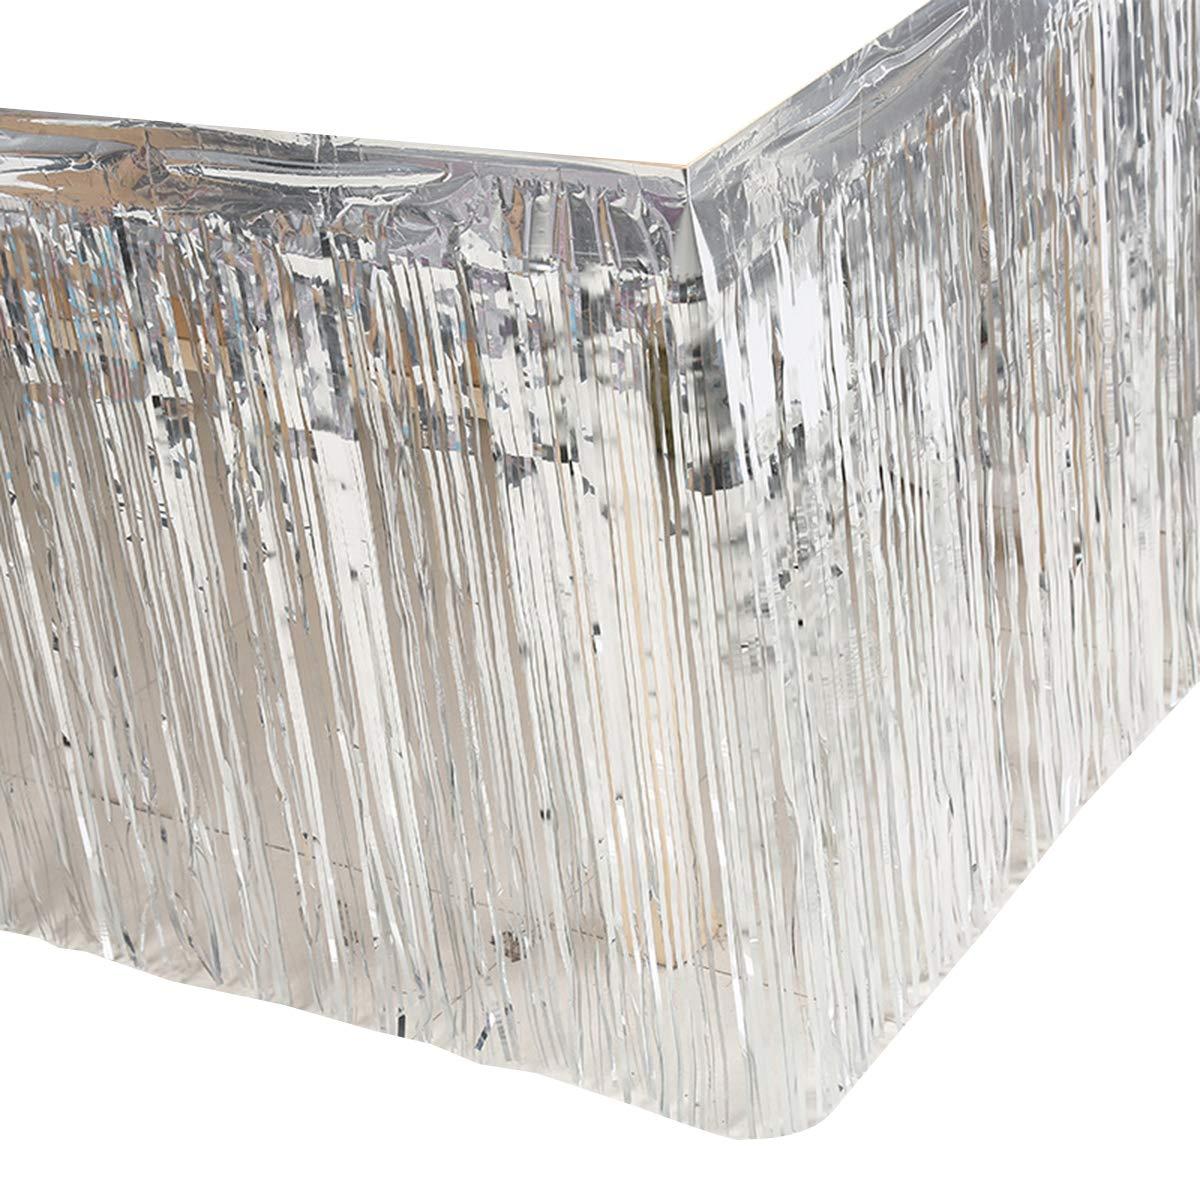 Leegleri 2 Pack Metallic Foil Fringe Table Skirt Silver Table Skirt Tinsel Party Table Skirt Banner for Mardi Gras Party(L108 inH 29in,Silver)